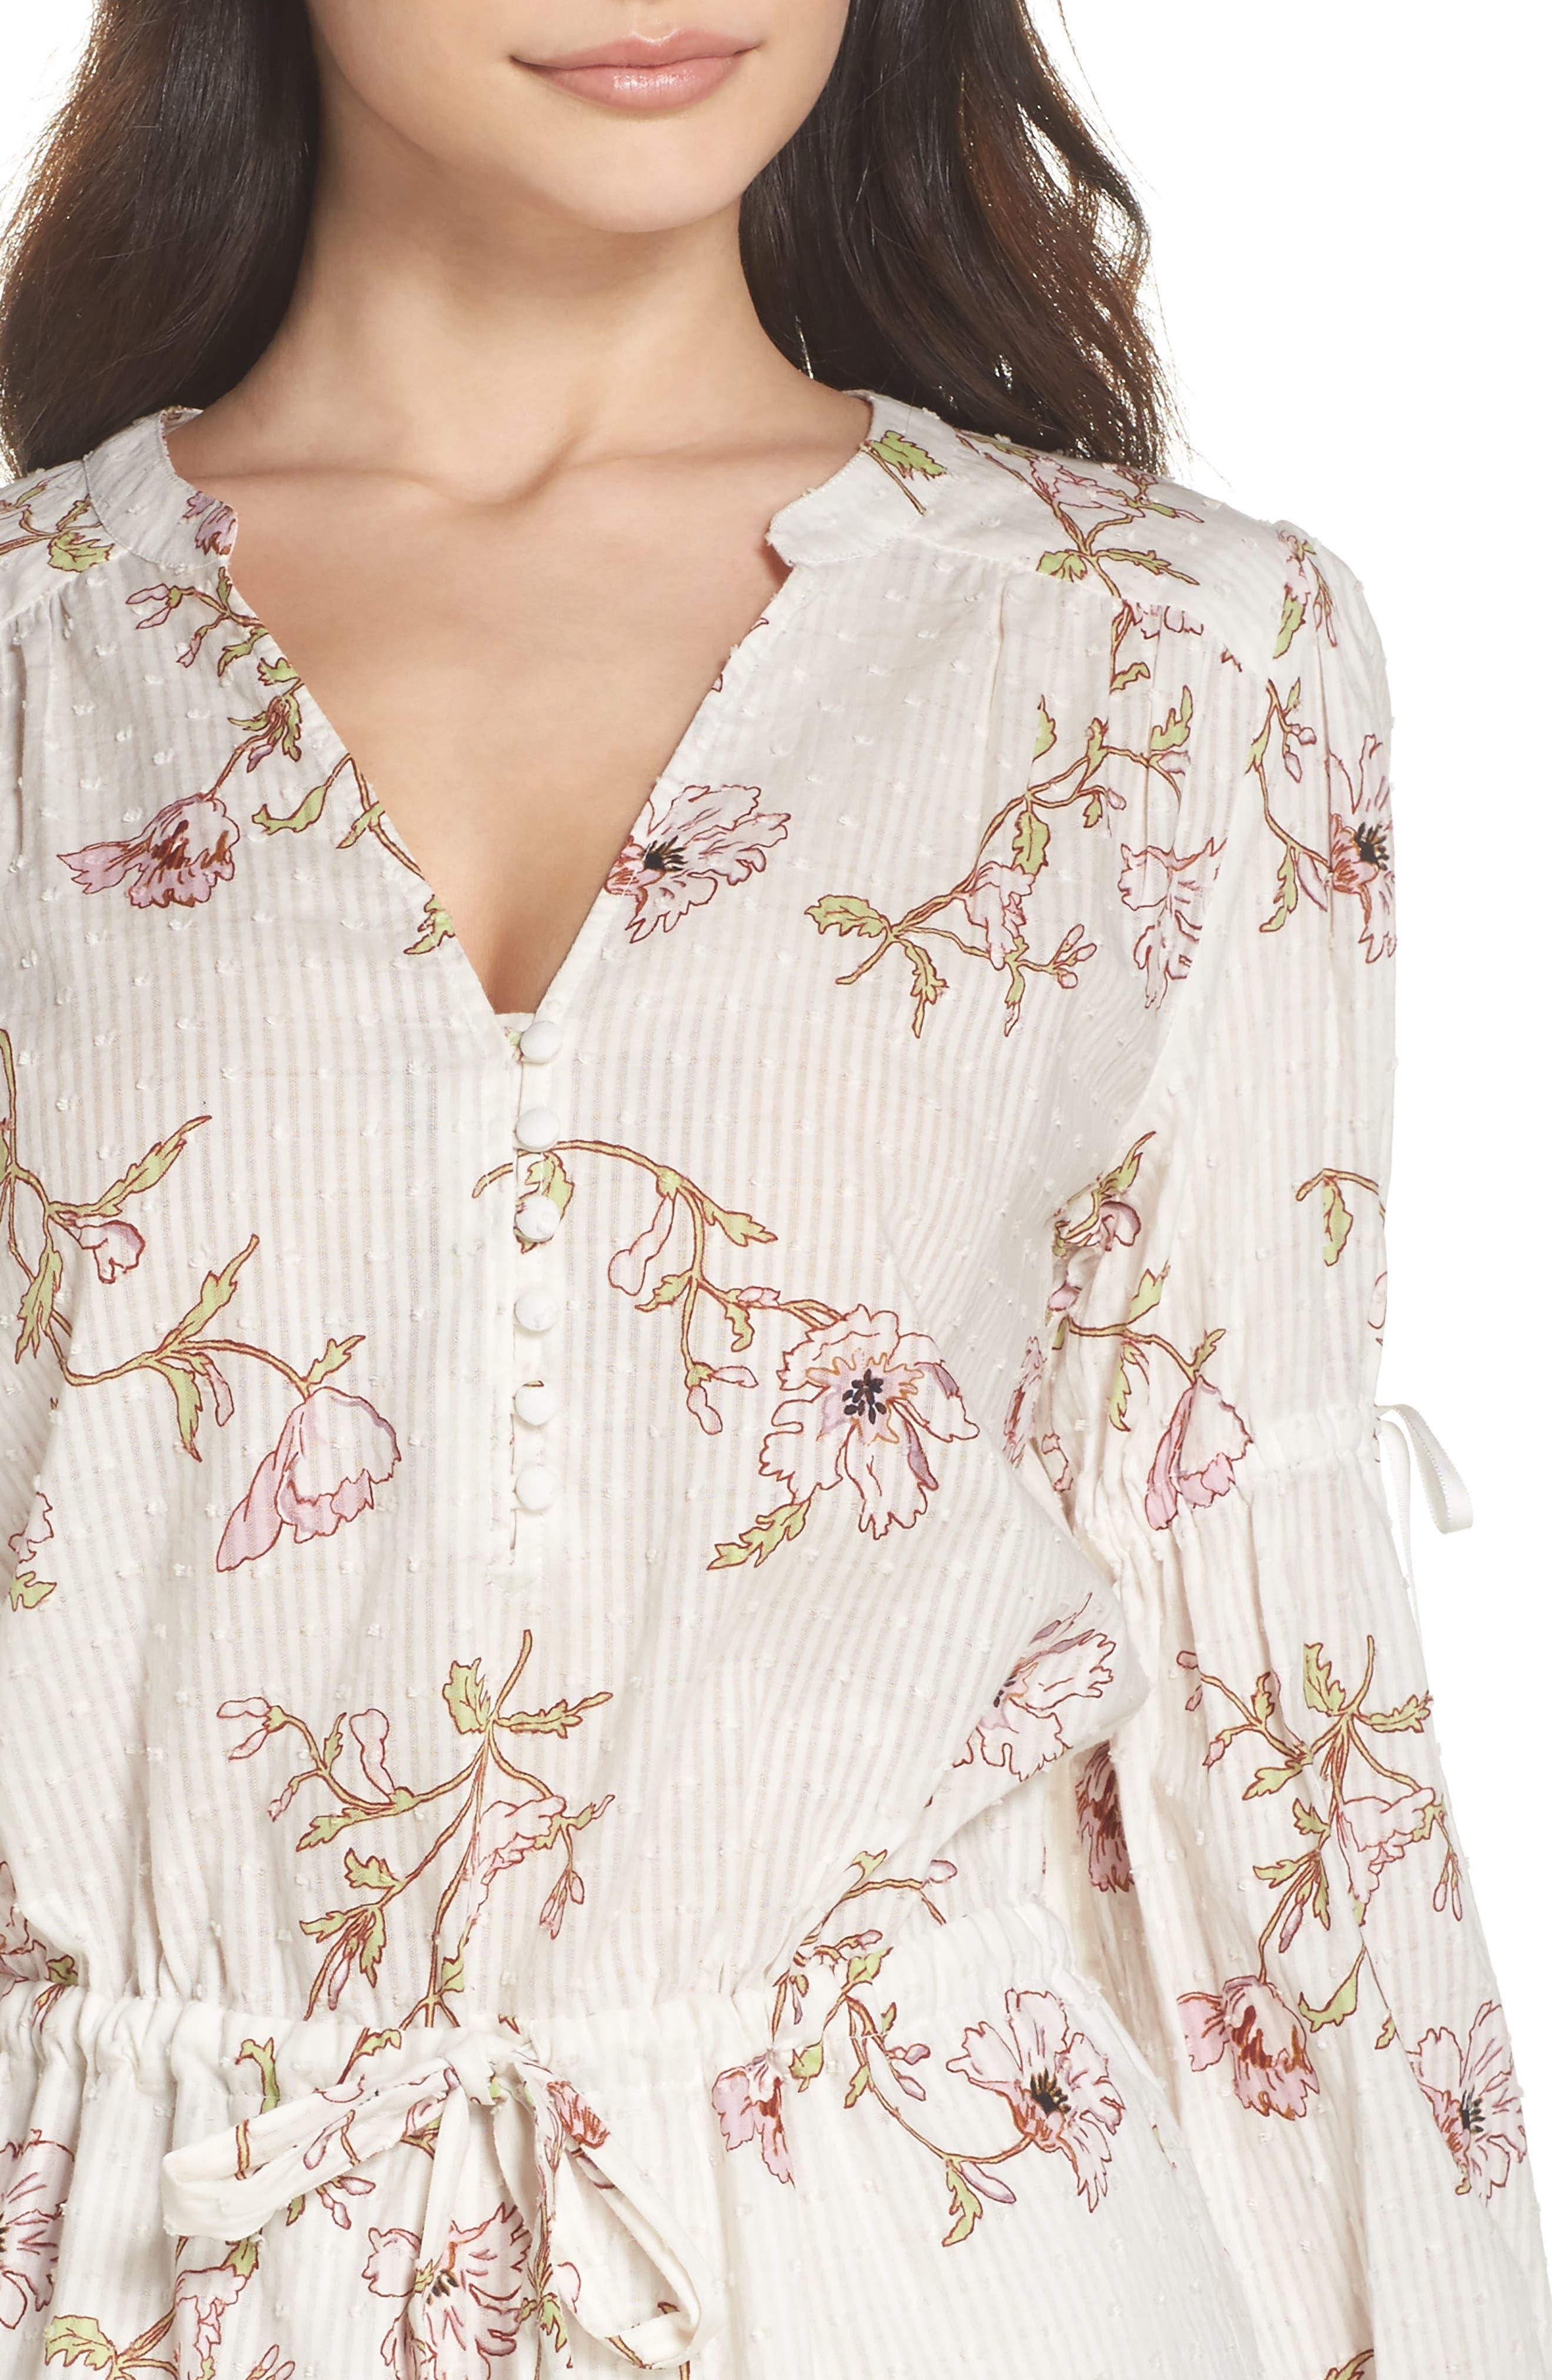 Yardley Floral Minidress,                             Alternate thumbnail 4, color,                             WHITE / MAUVE SHADOWS